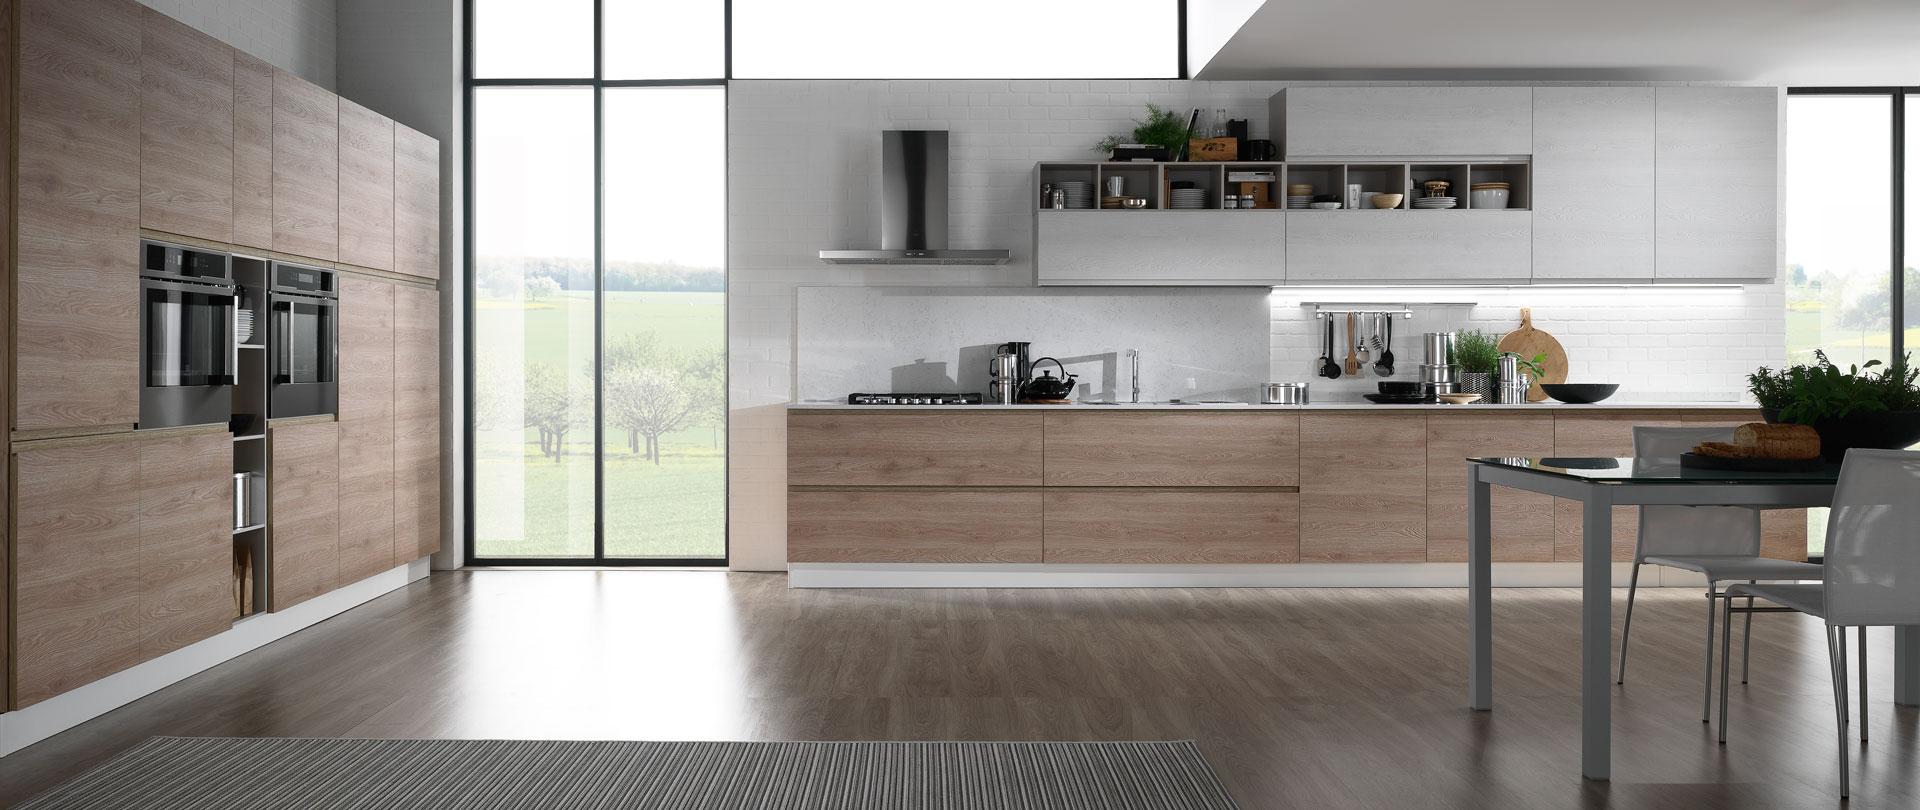 03-cucina-moderna-top-quarzo-luna